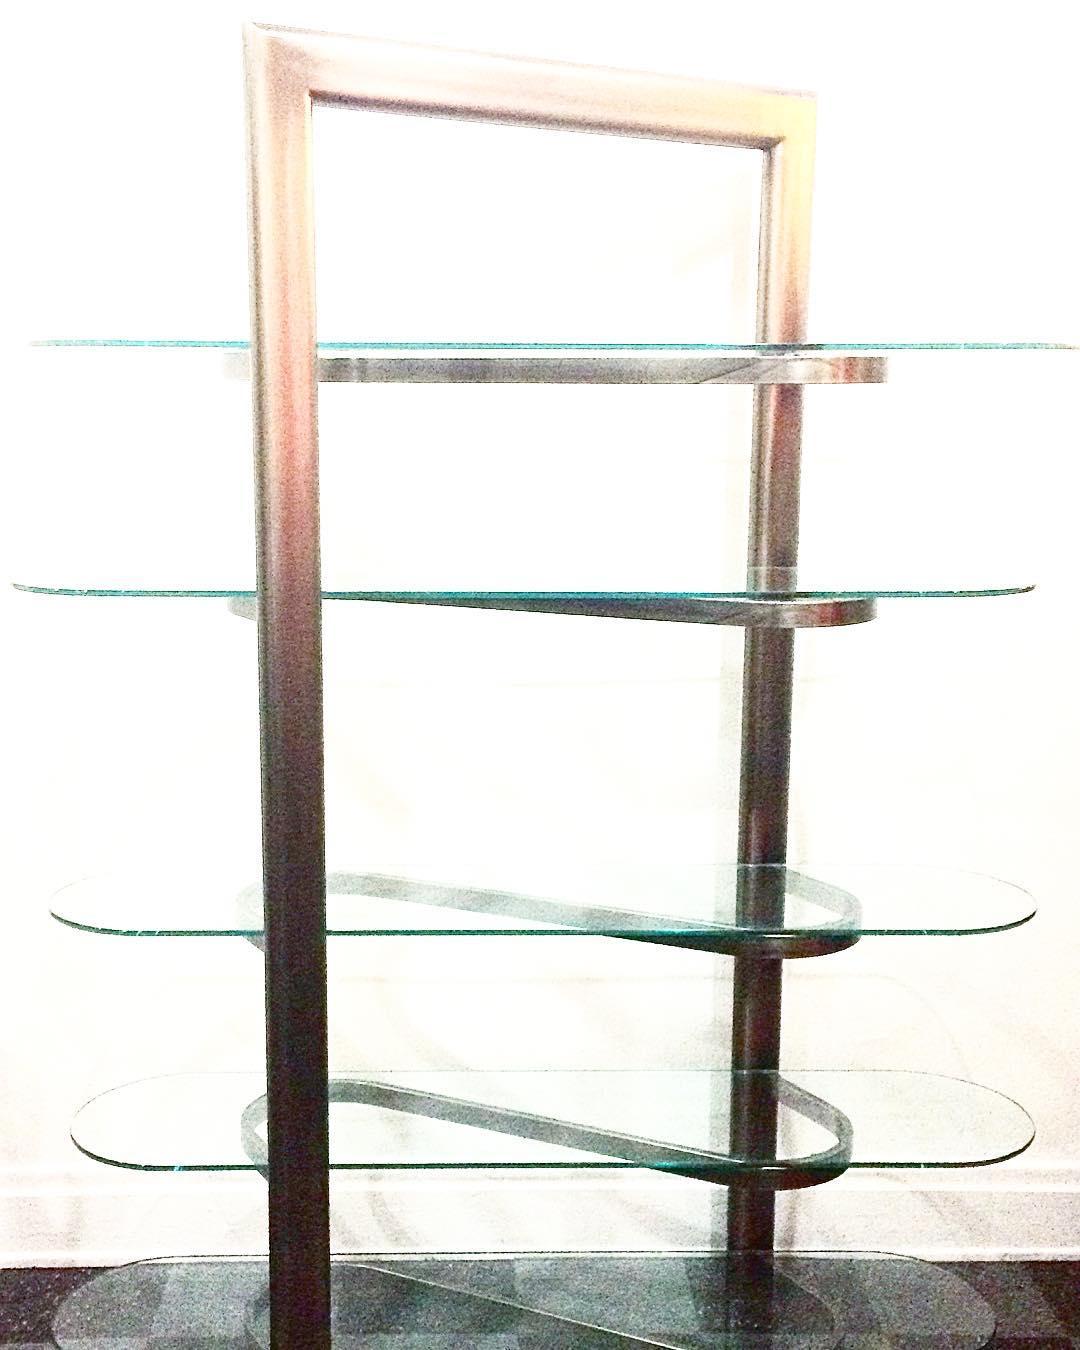 Modern ribbon shelf, brushed aluminum & glass, $400